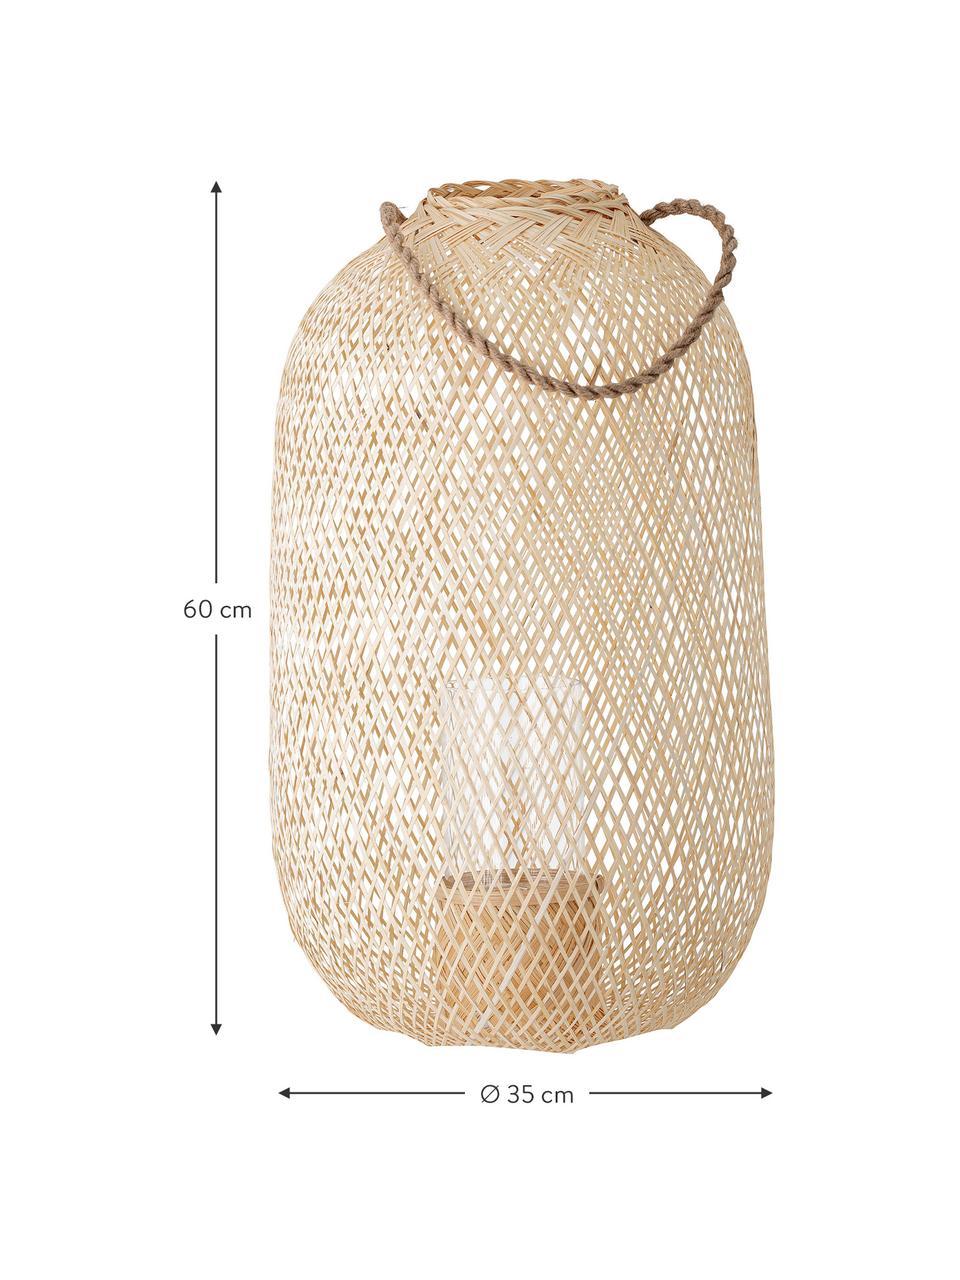 Laterne Musu aus Jute, Griff: Jute, Beige, Ø 35 x H 60 cm